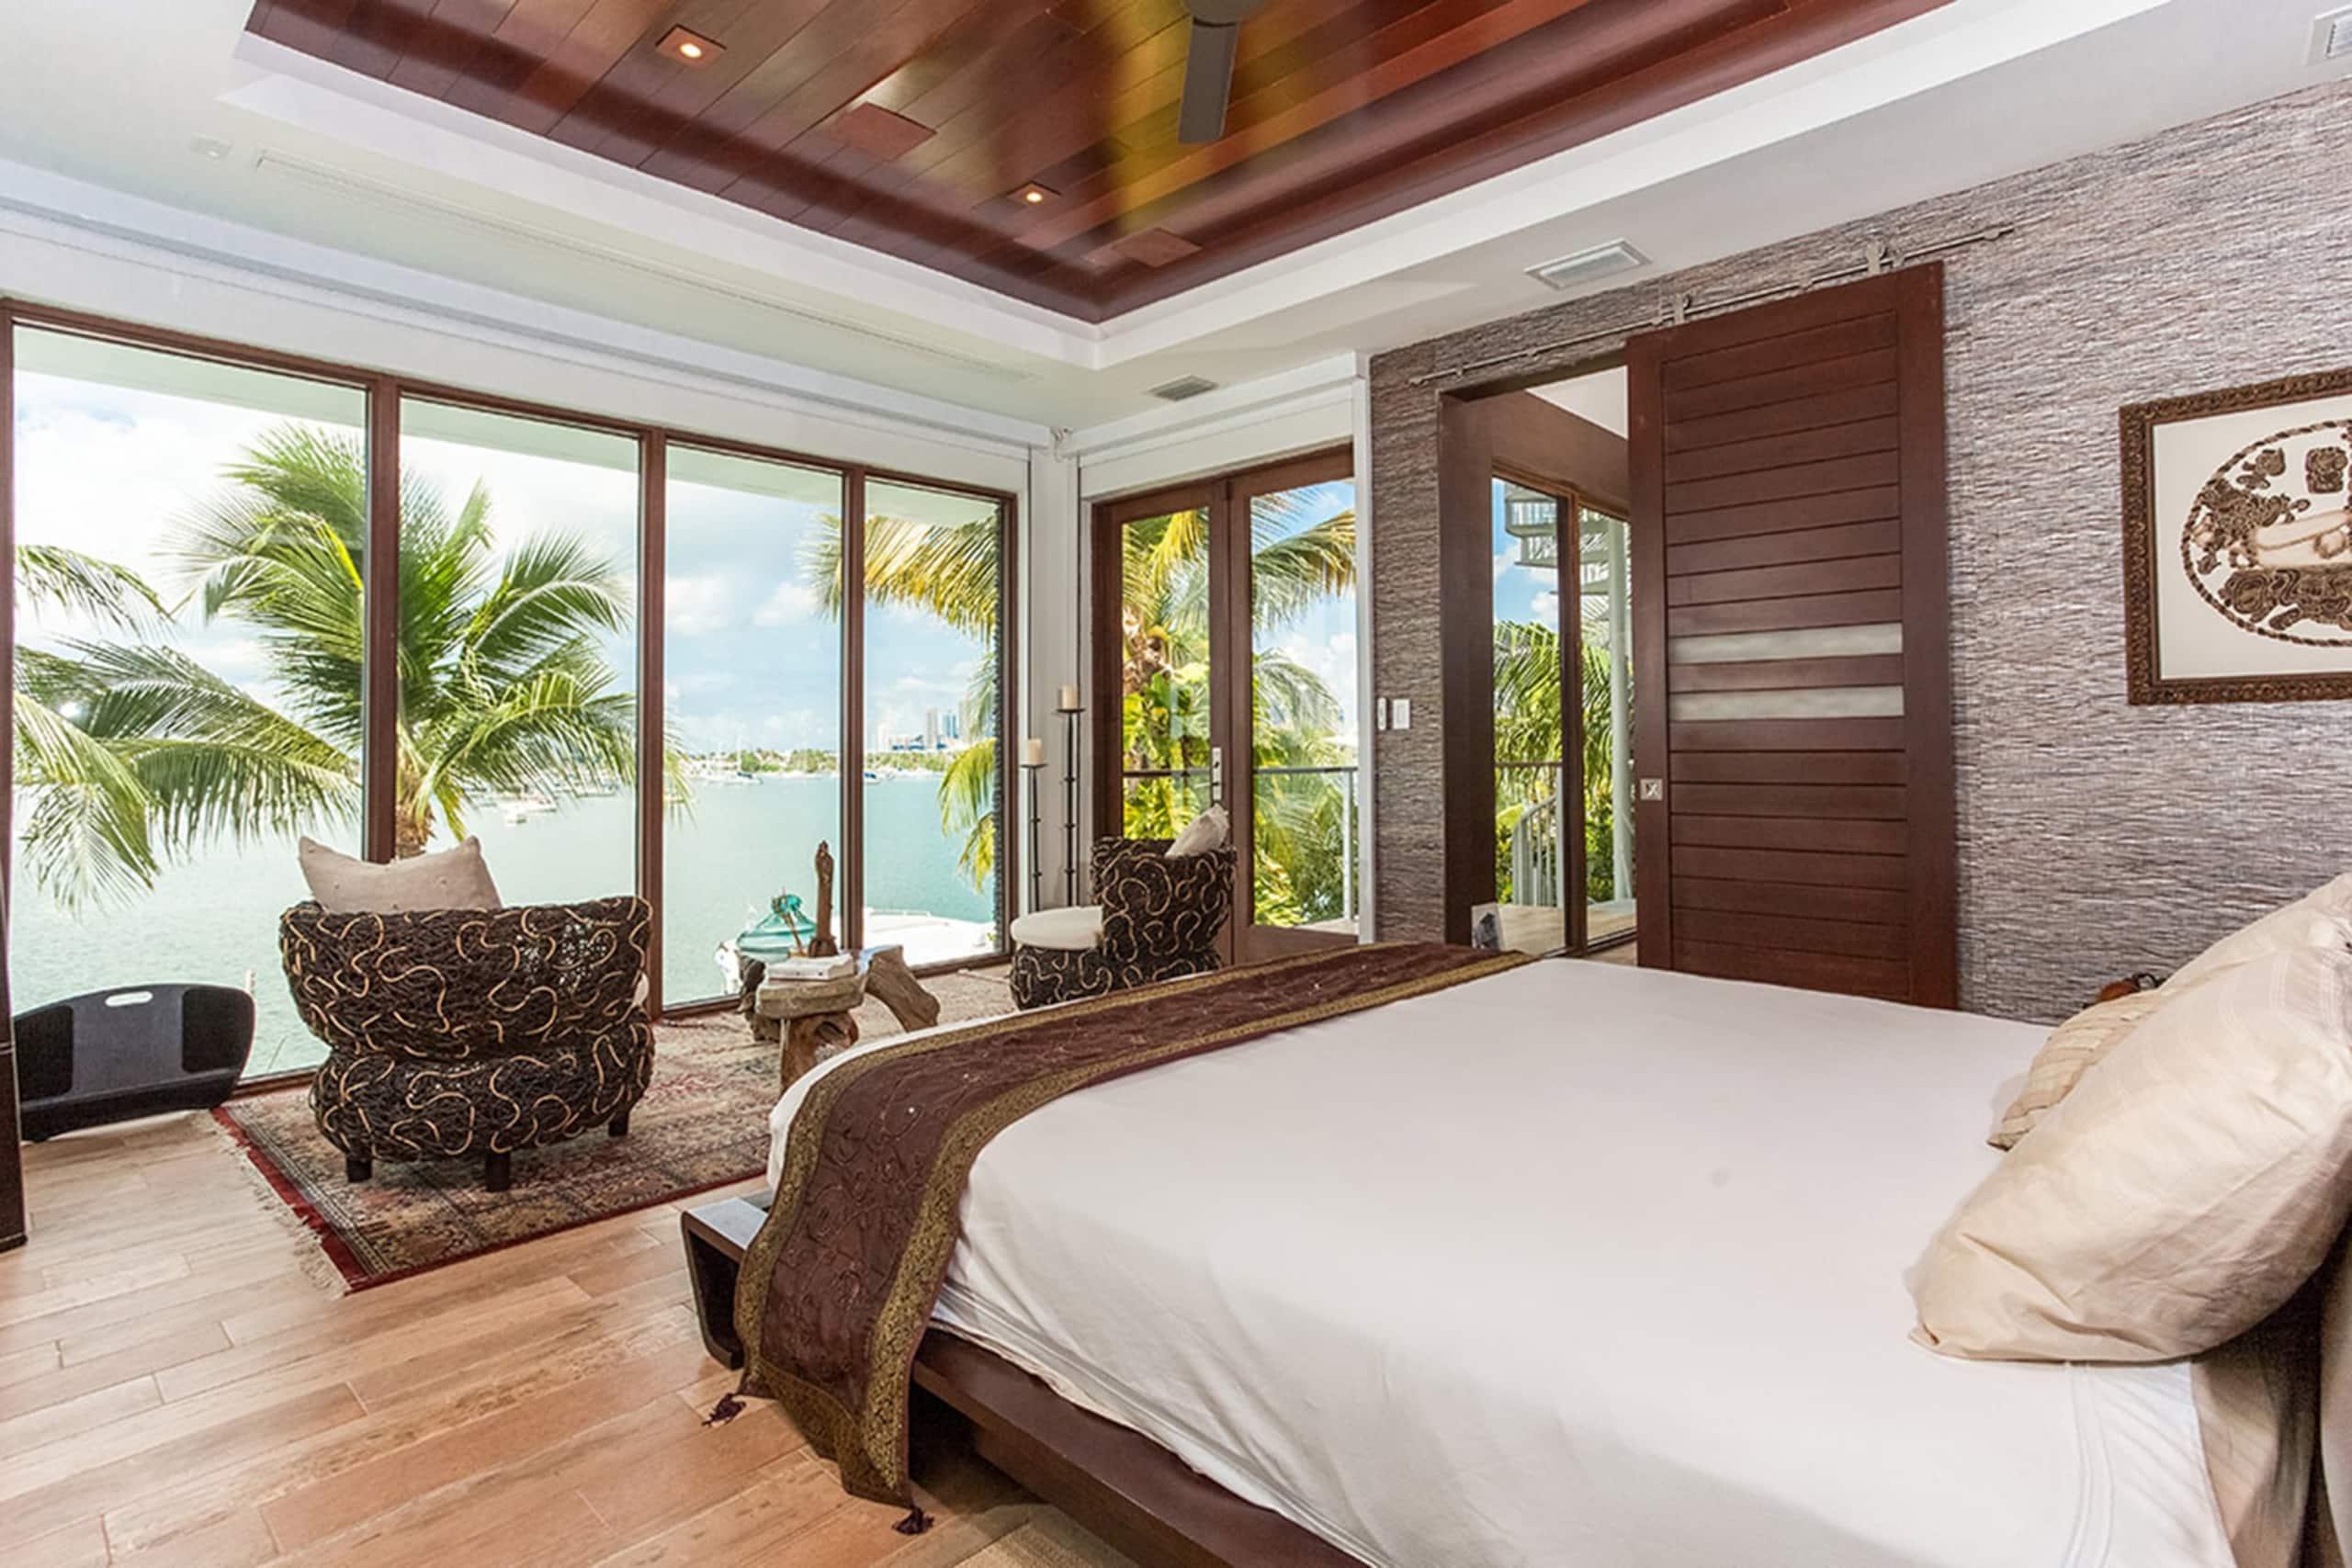 Villa Riza - Magnificent Balinese-style photo 20276287